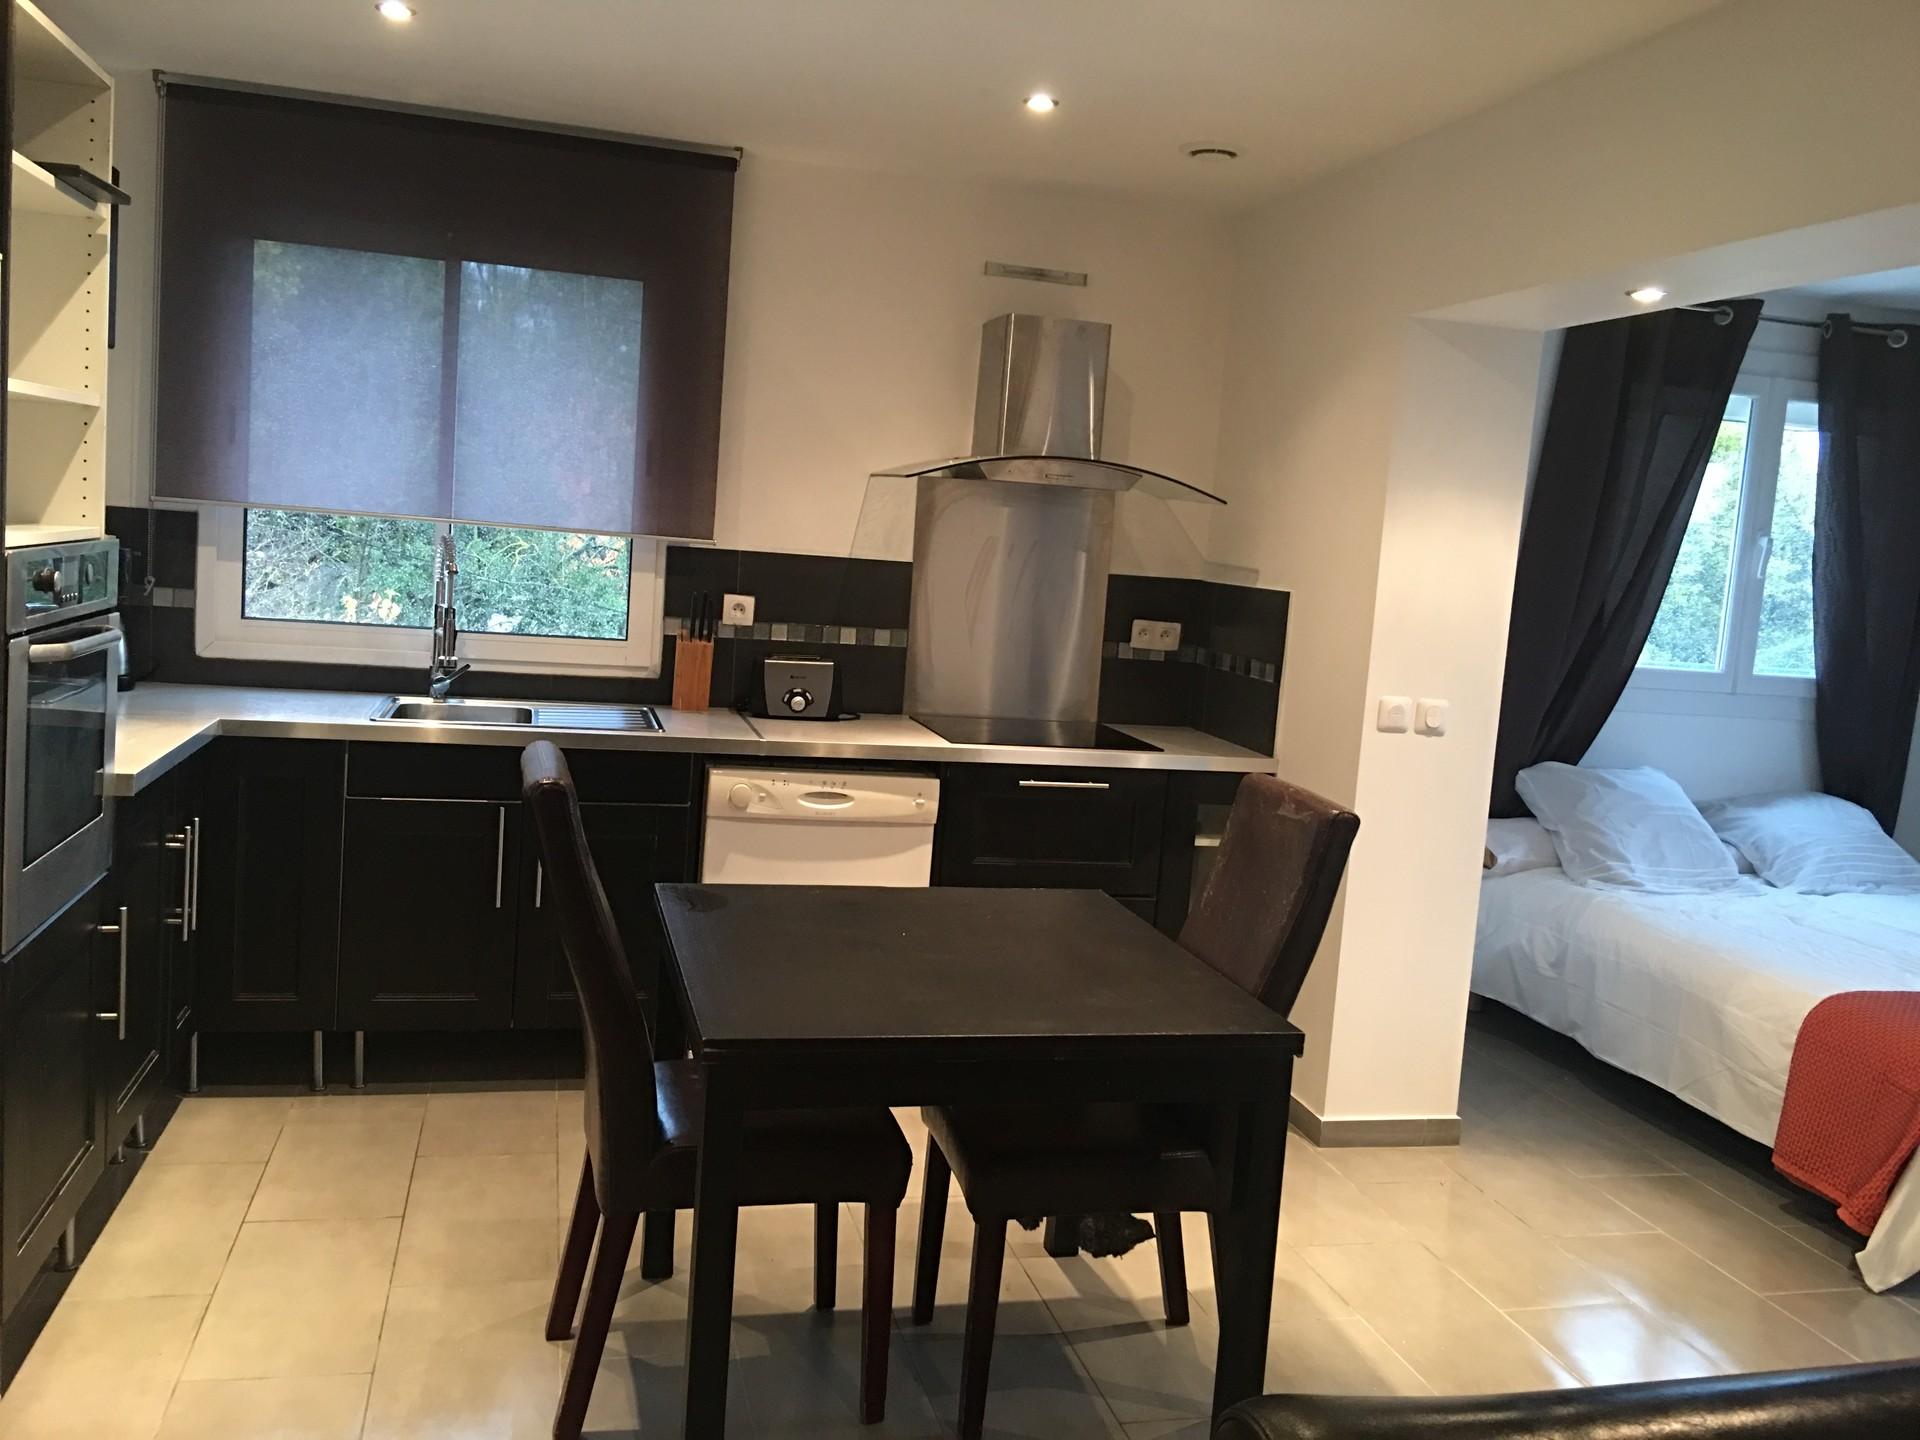 Bel appartement type loft proche aix en provence  Location appartements AixenProvence